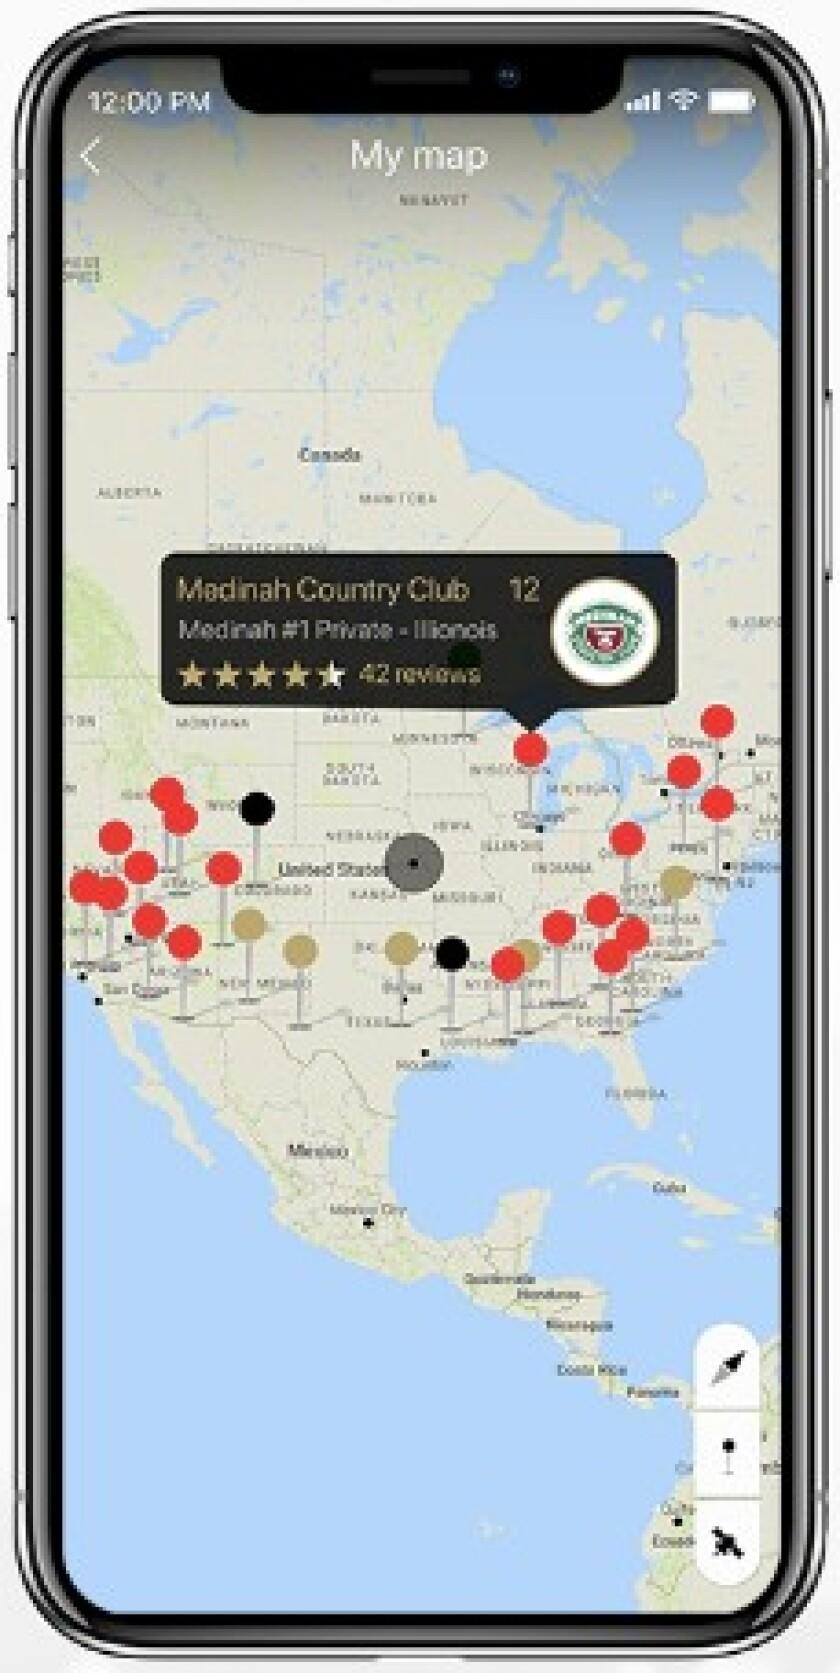 GolfPlayed app